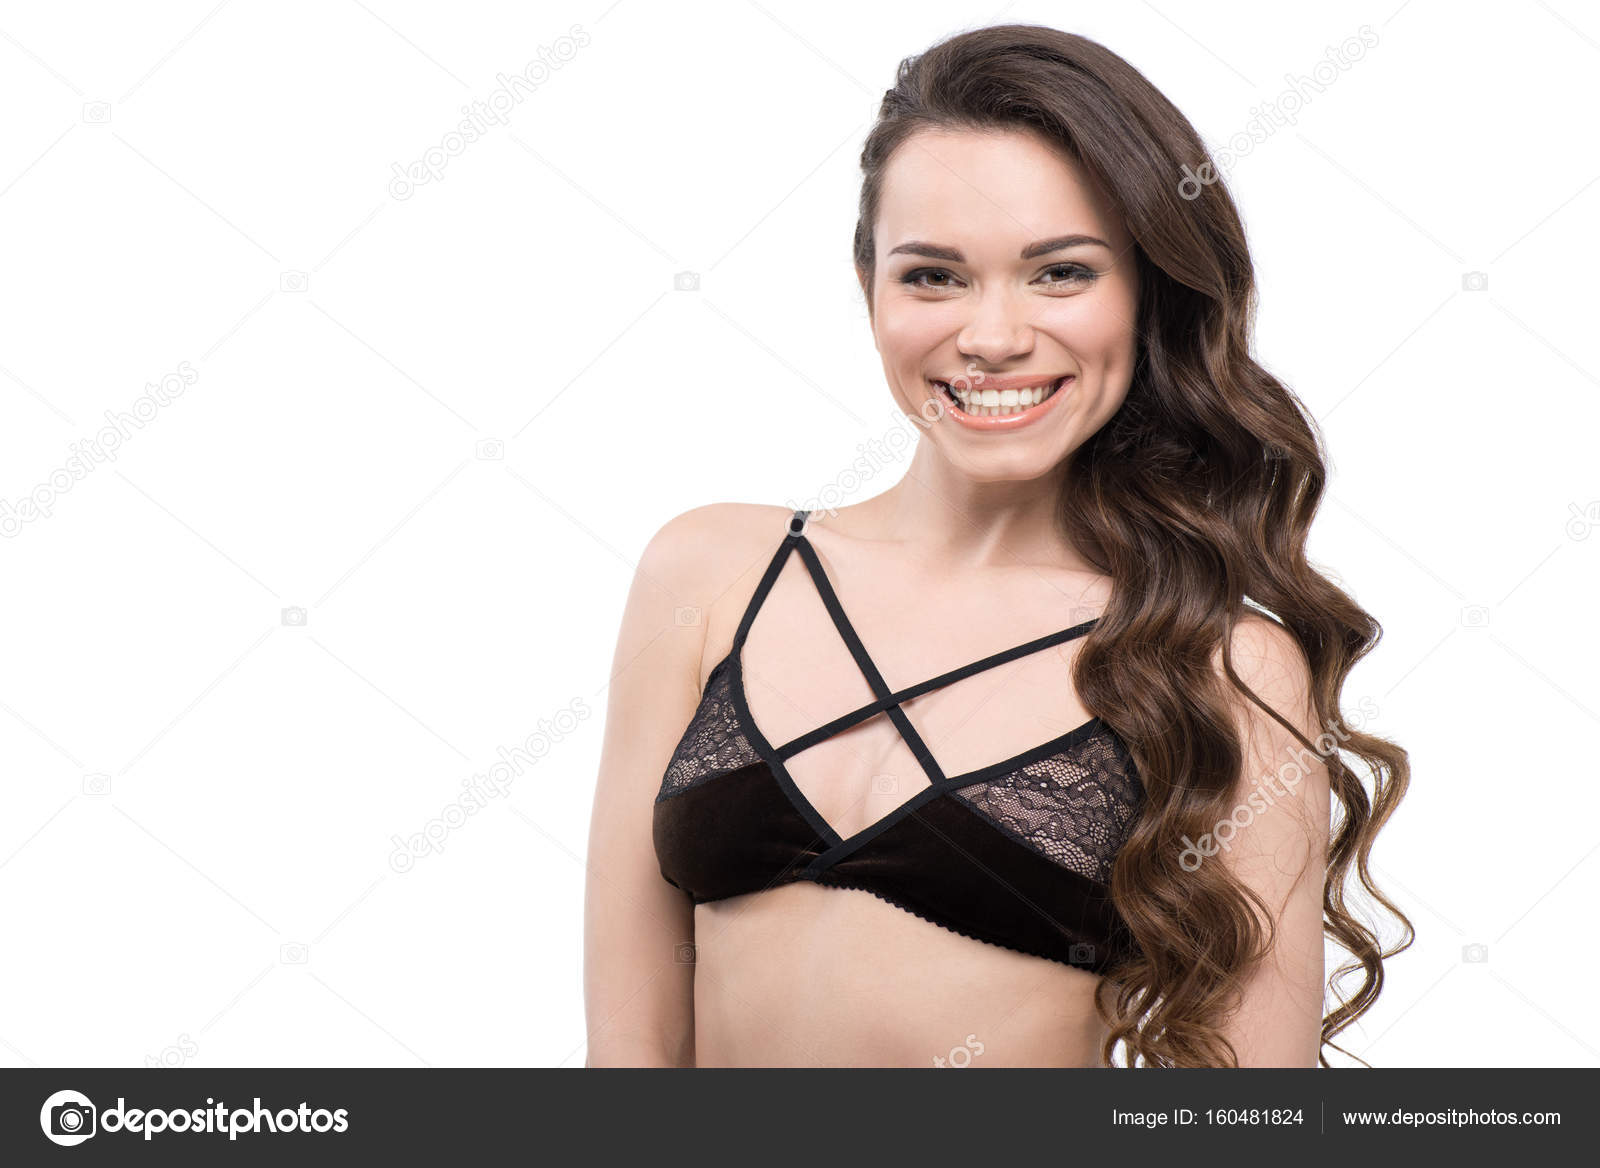 4686cbf8496 young woman wearing lingerie — Stock Photo © DmitryPoch  160481824